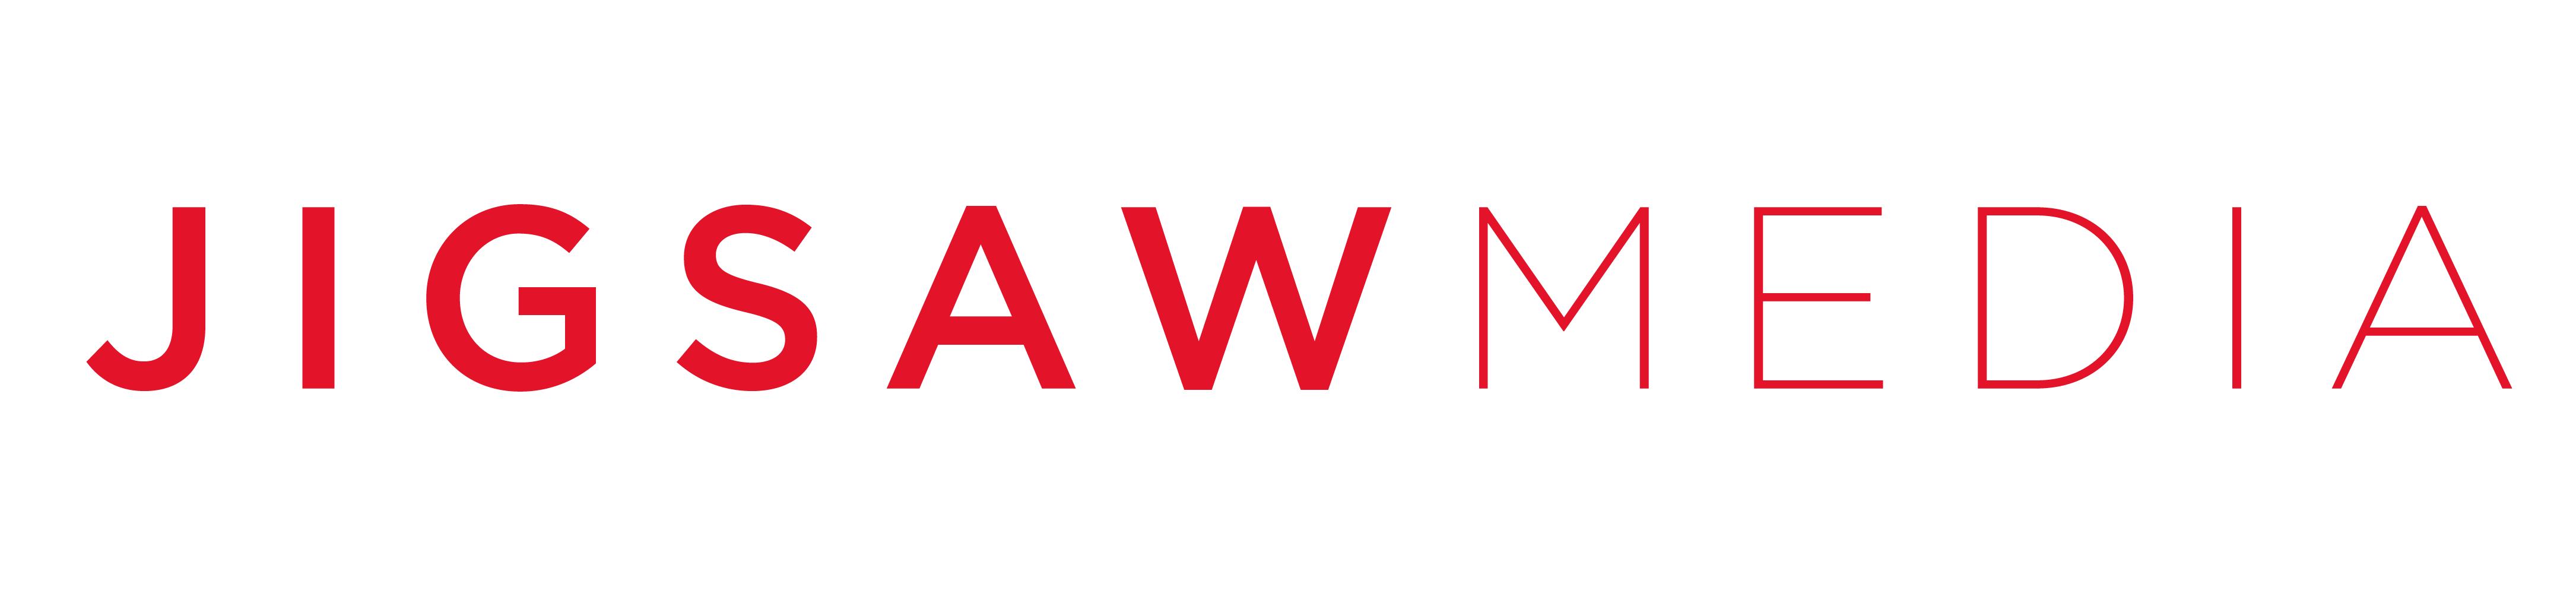 Jigsaw Media